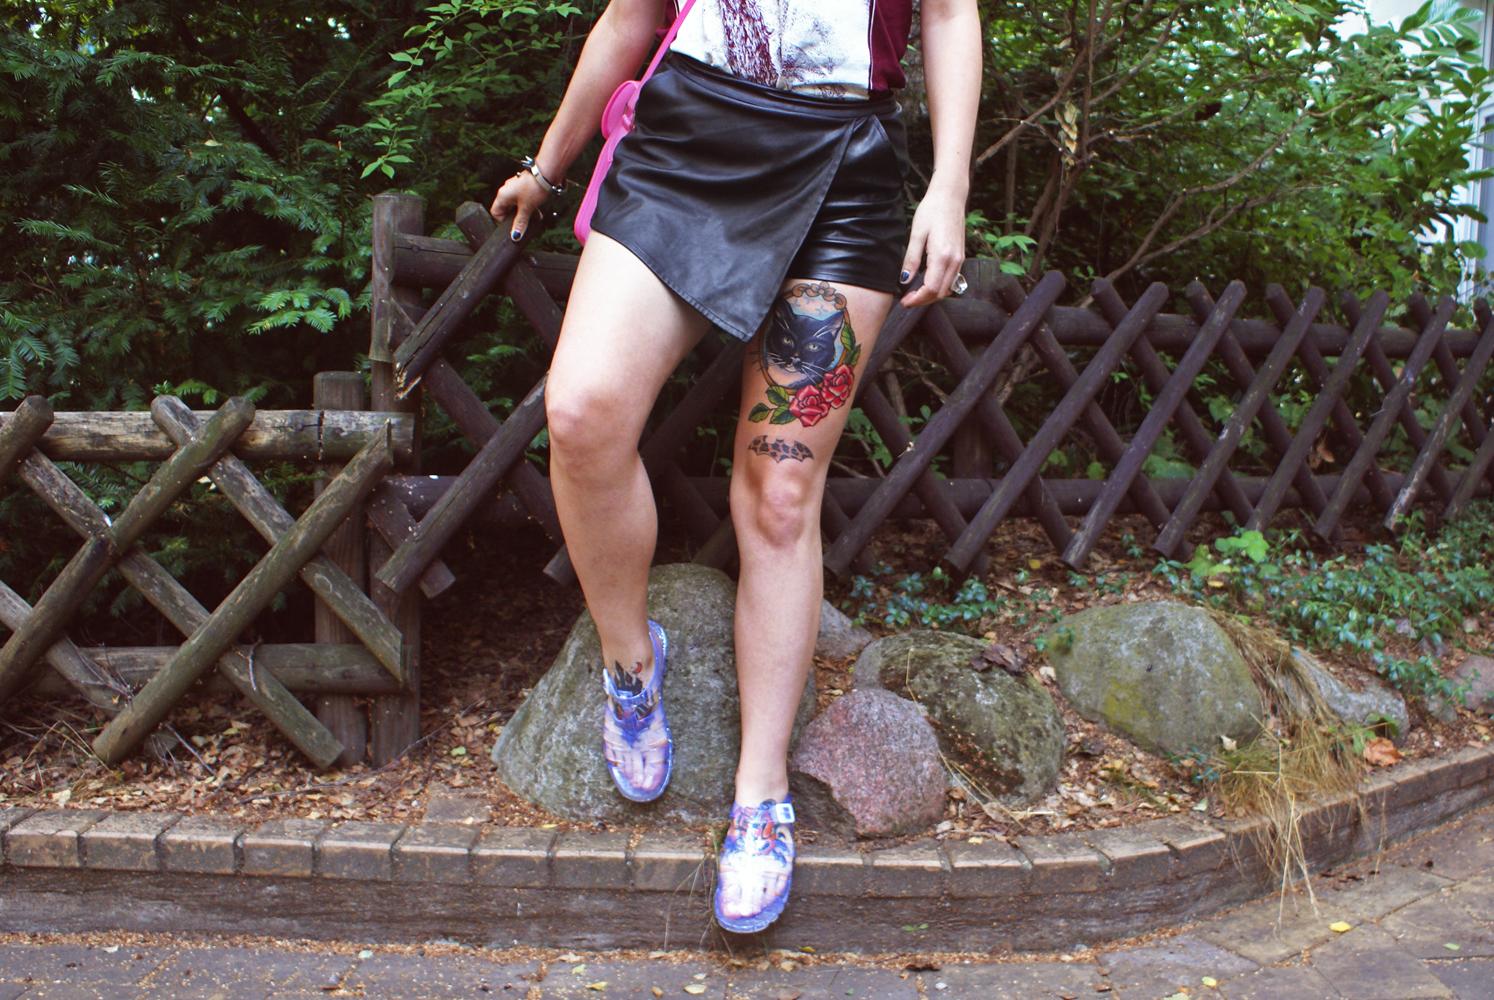 viva belgrado, bandshirt, merch, boohoo, satchel, pink, tattoos, skort, shorts, ledershorts, kunstleder, vegan leather, jelly shoues